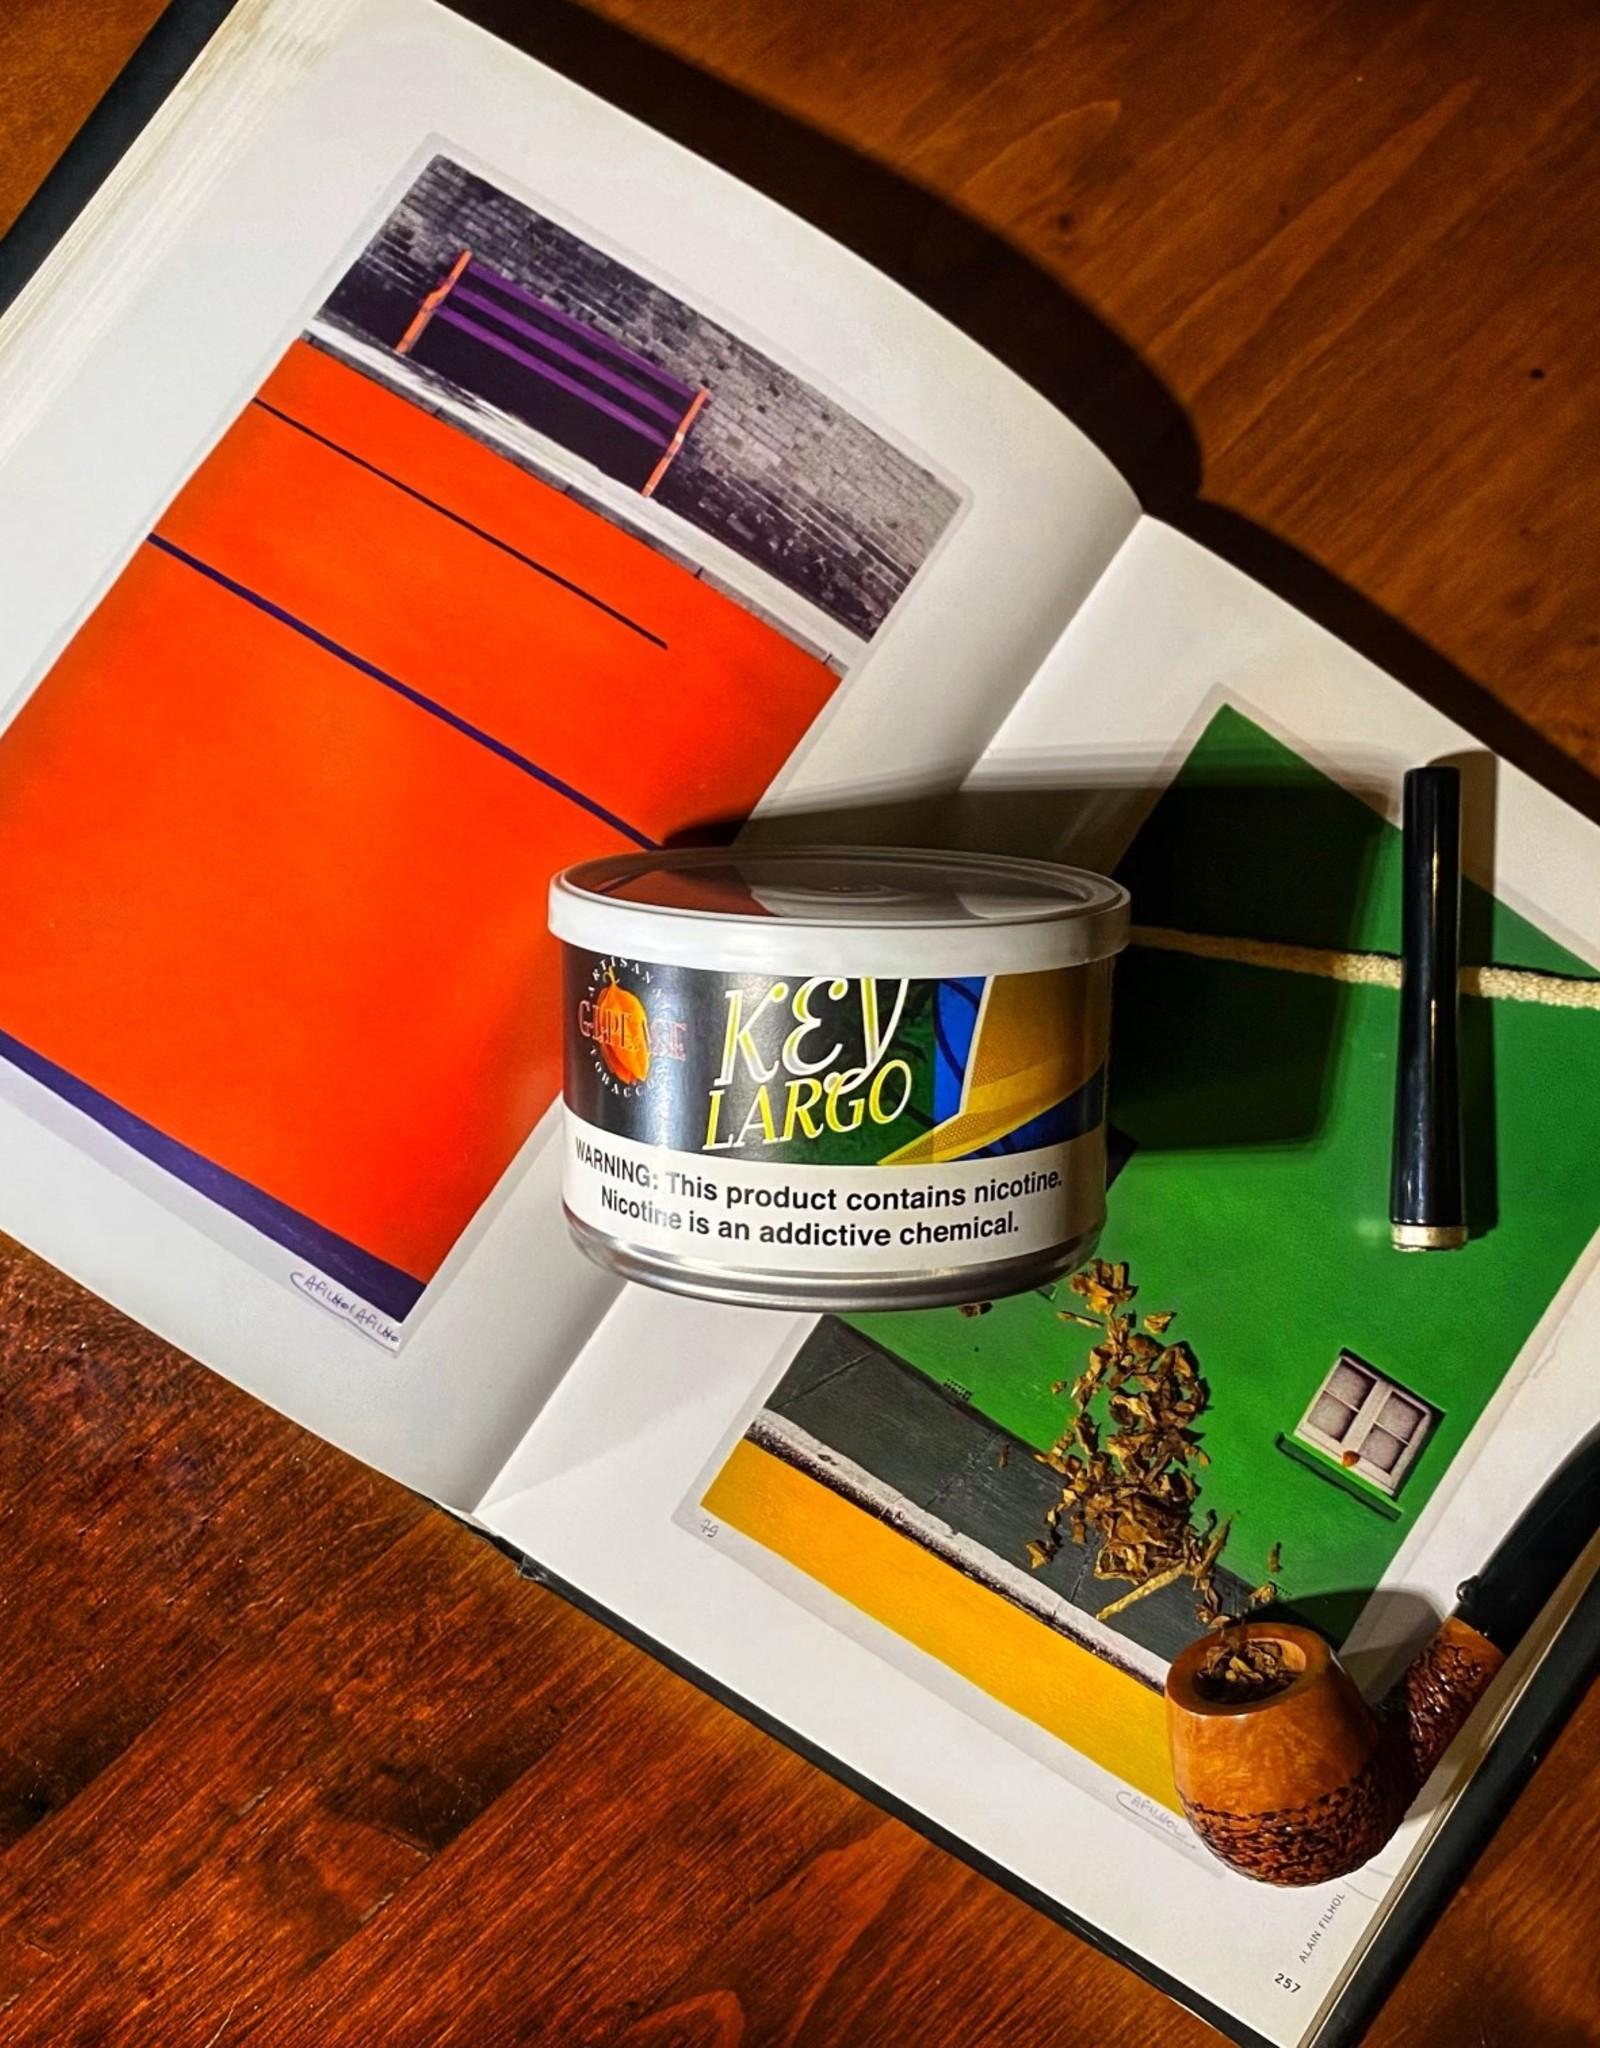 G.L. Pease G.L. Pease Pipe Tobacco Key Largo 2oz